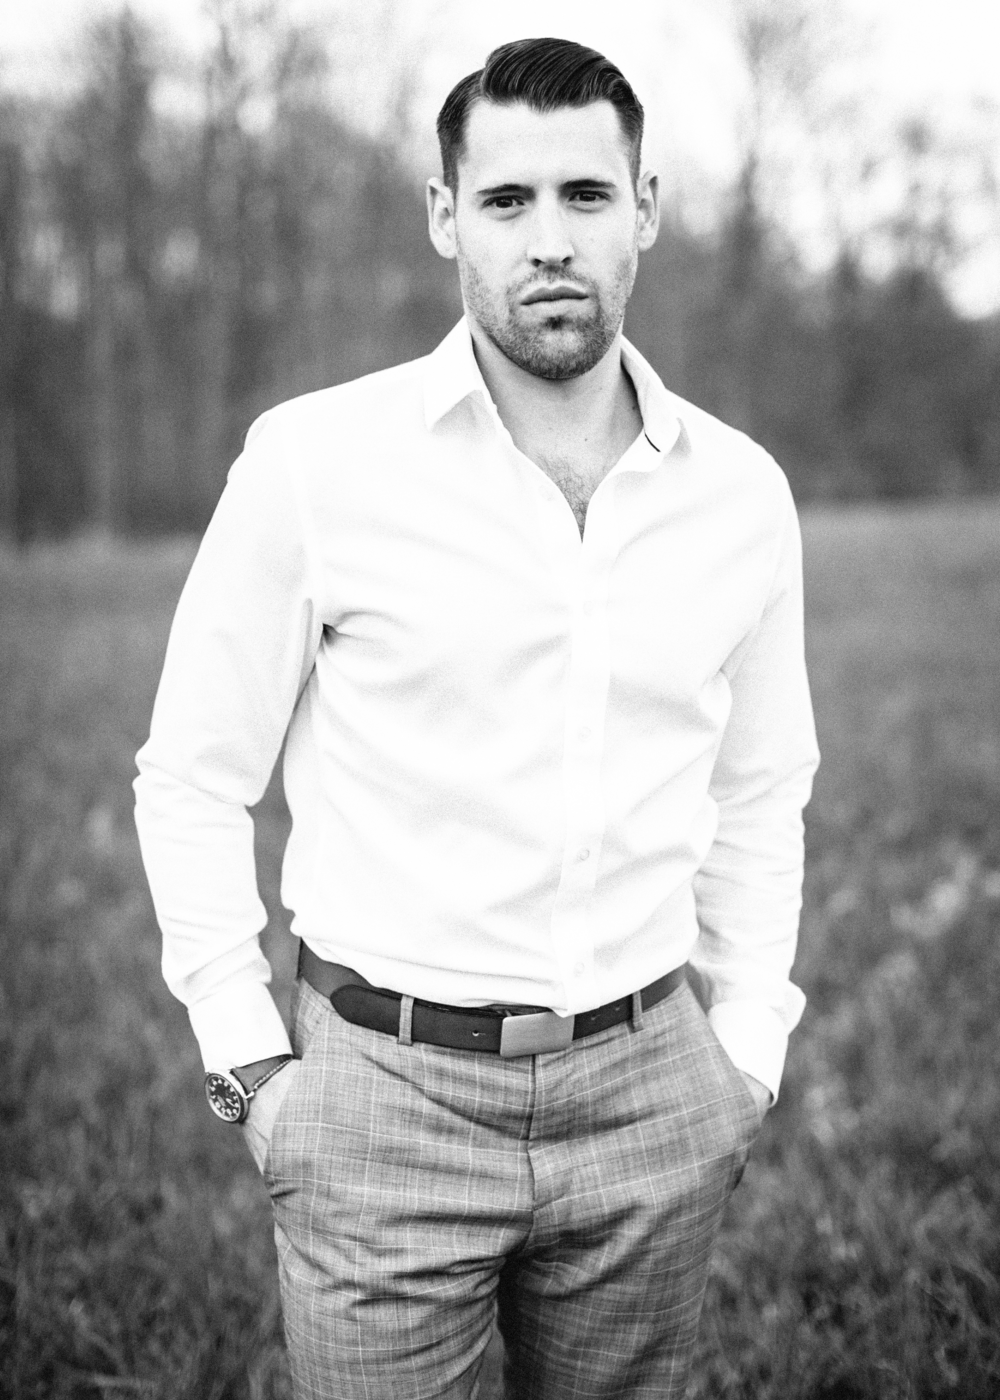 Cameron T. Peralta